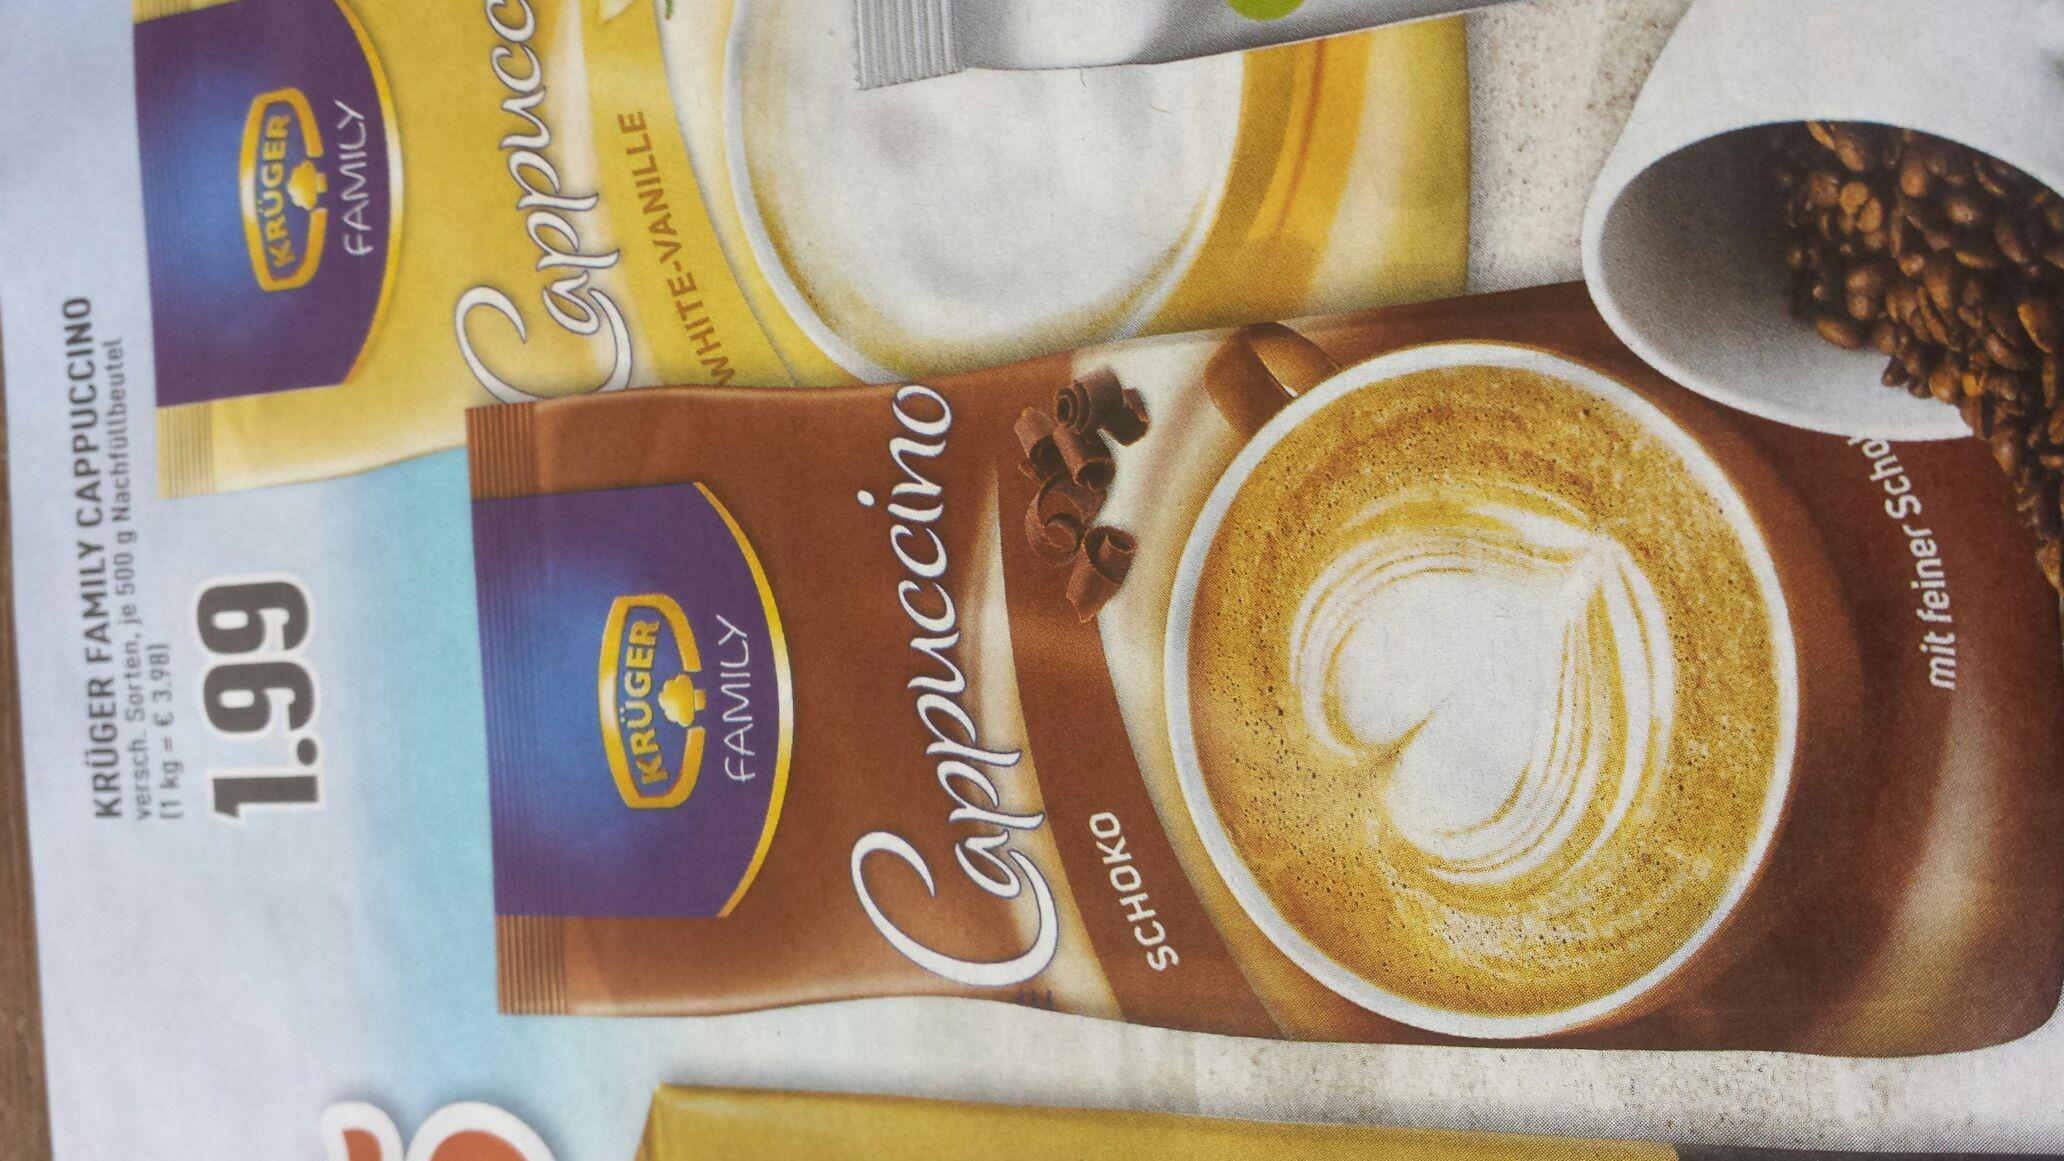 Super Preis Krüger Family Cappuccino bei Edeka in Herbern